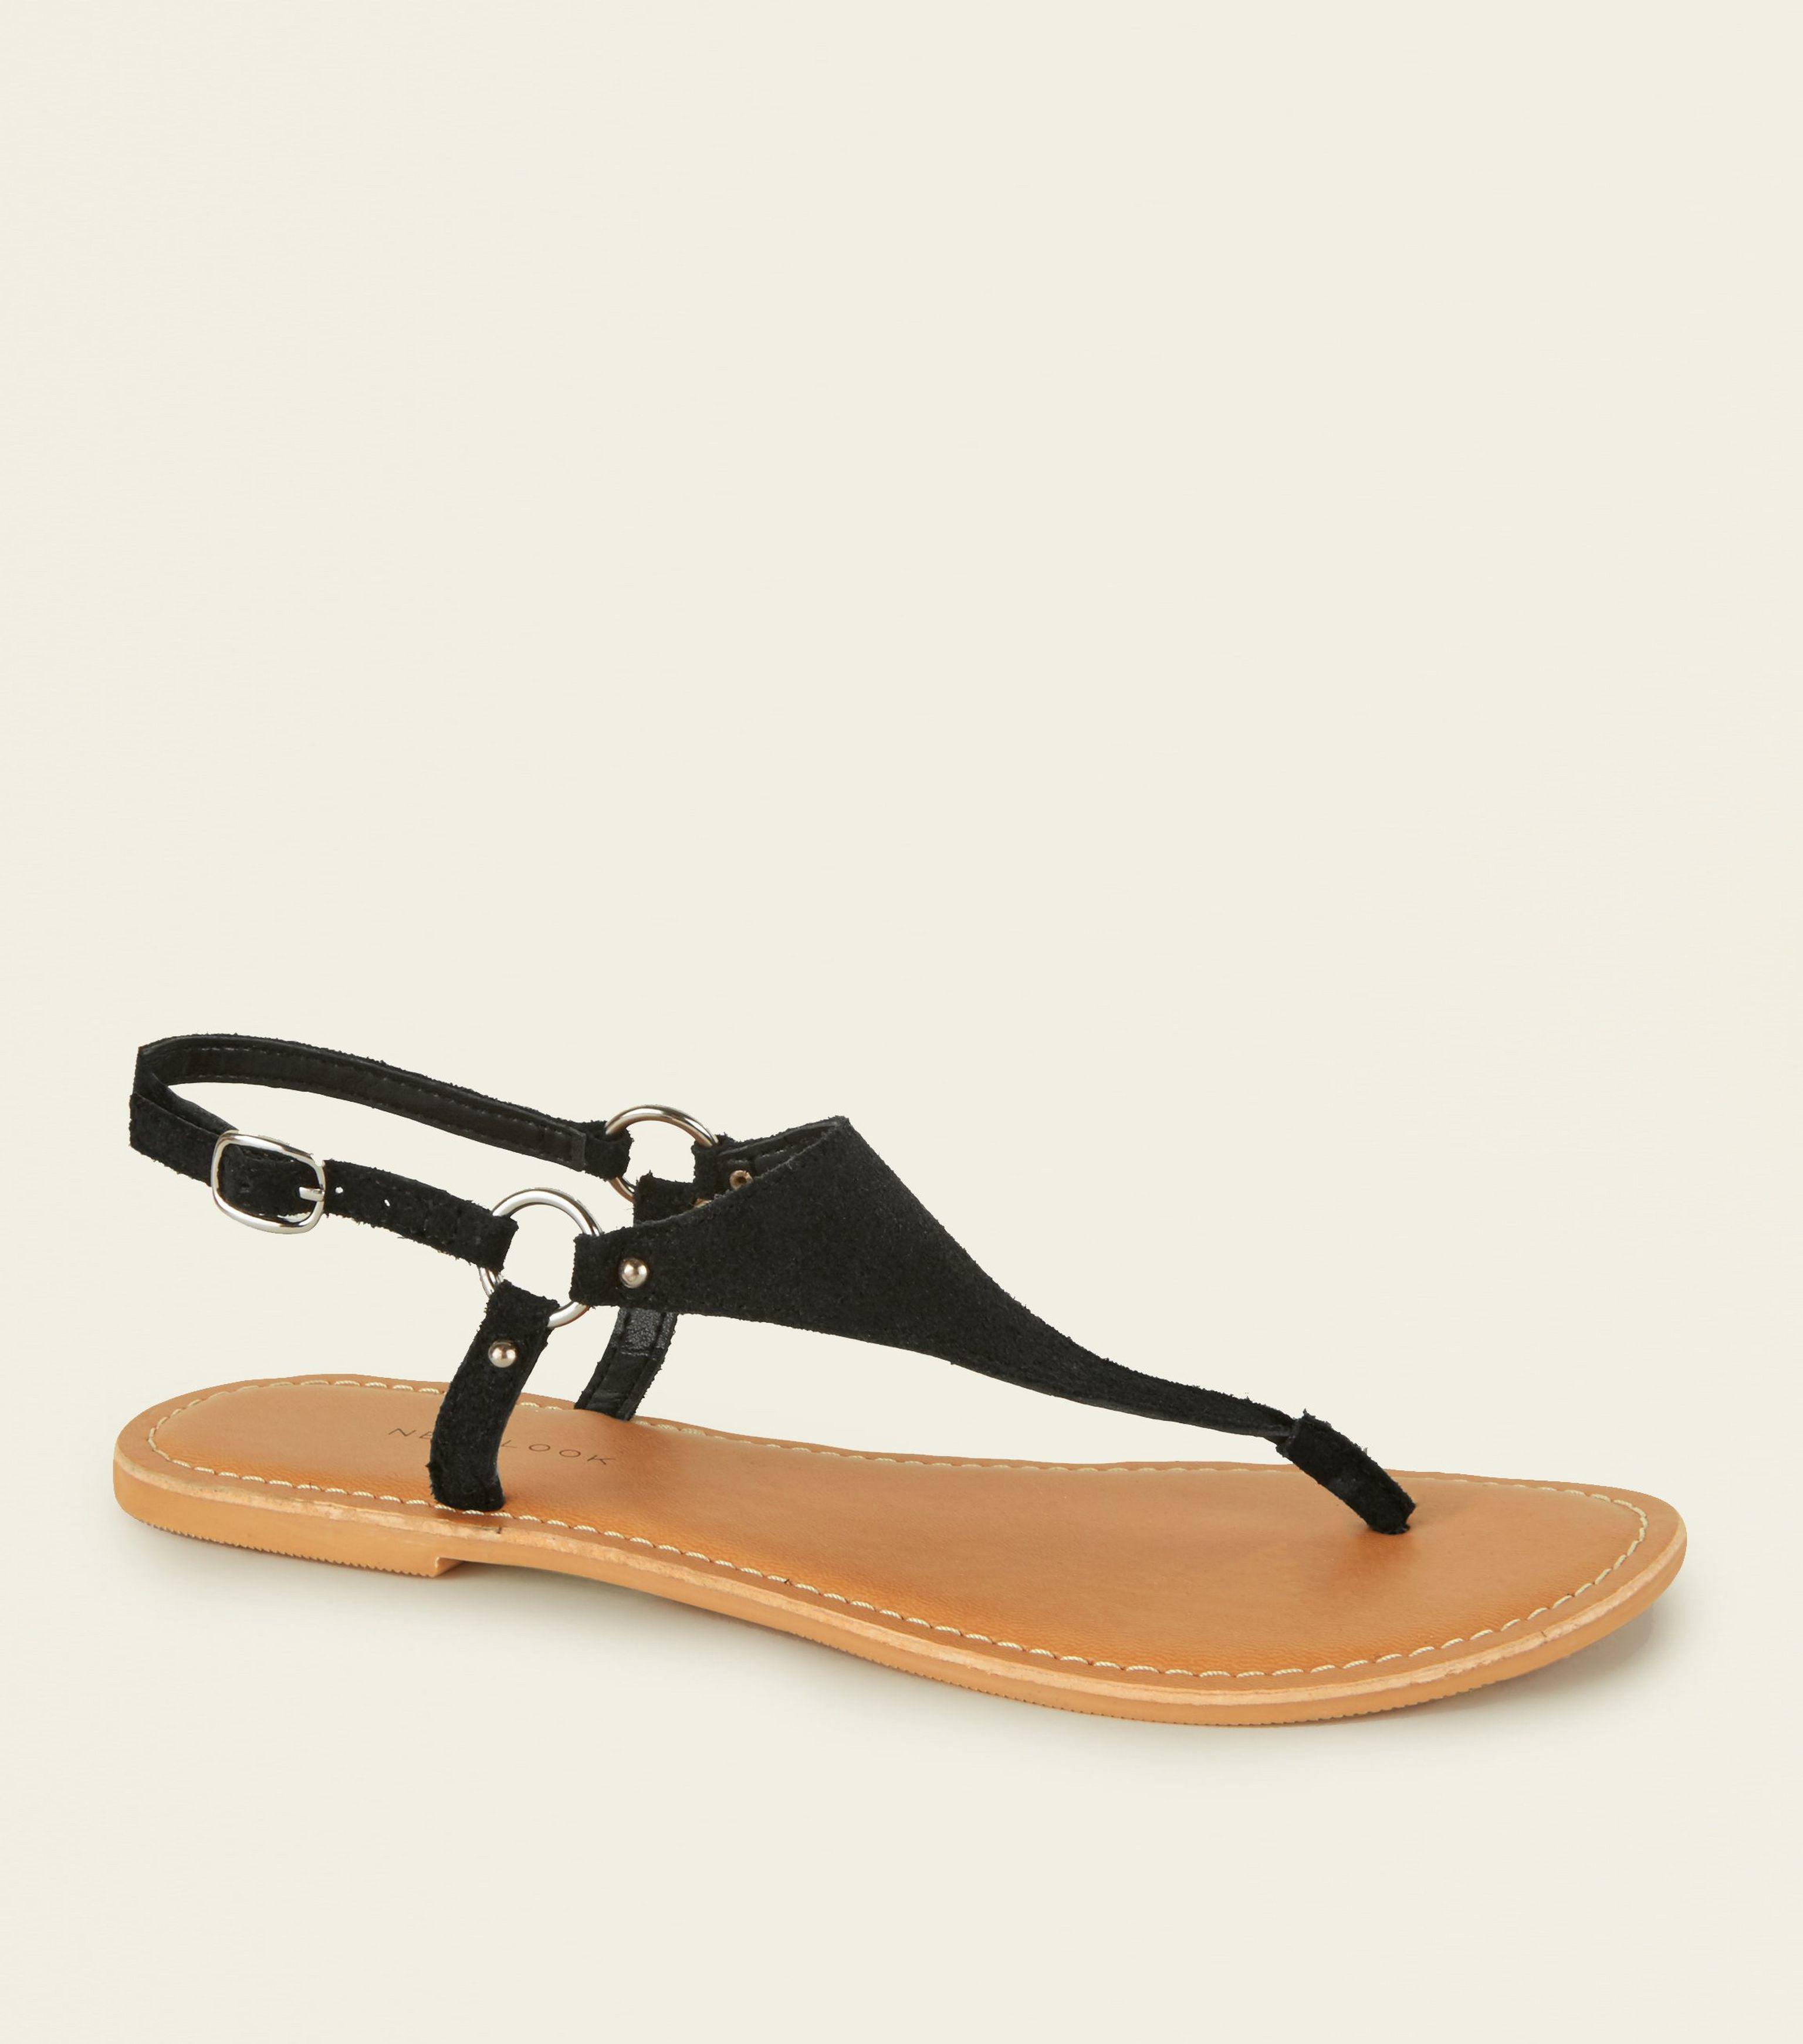 93de0e77e71 New Look Wide Fit Black Suede Flat Sandals in Black - Lyst